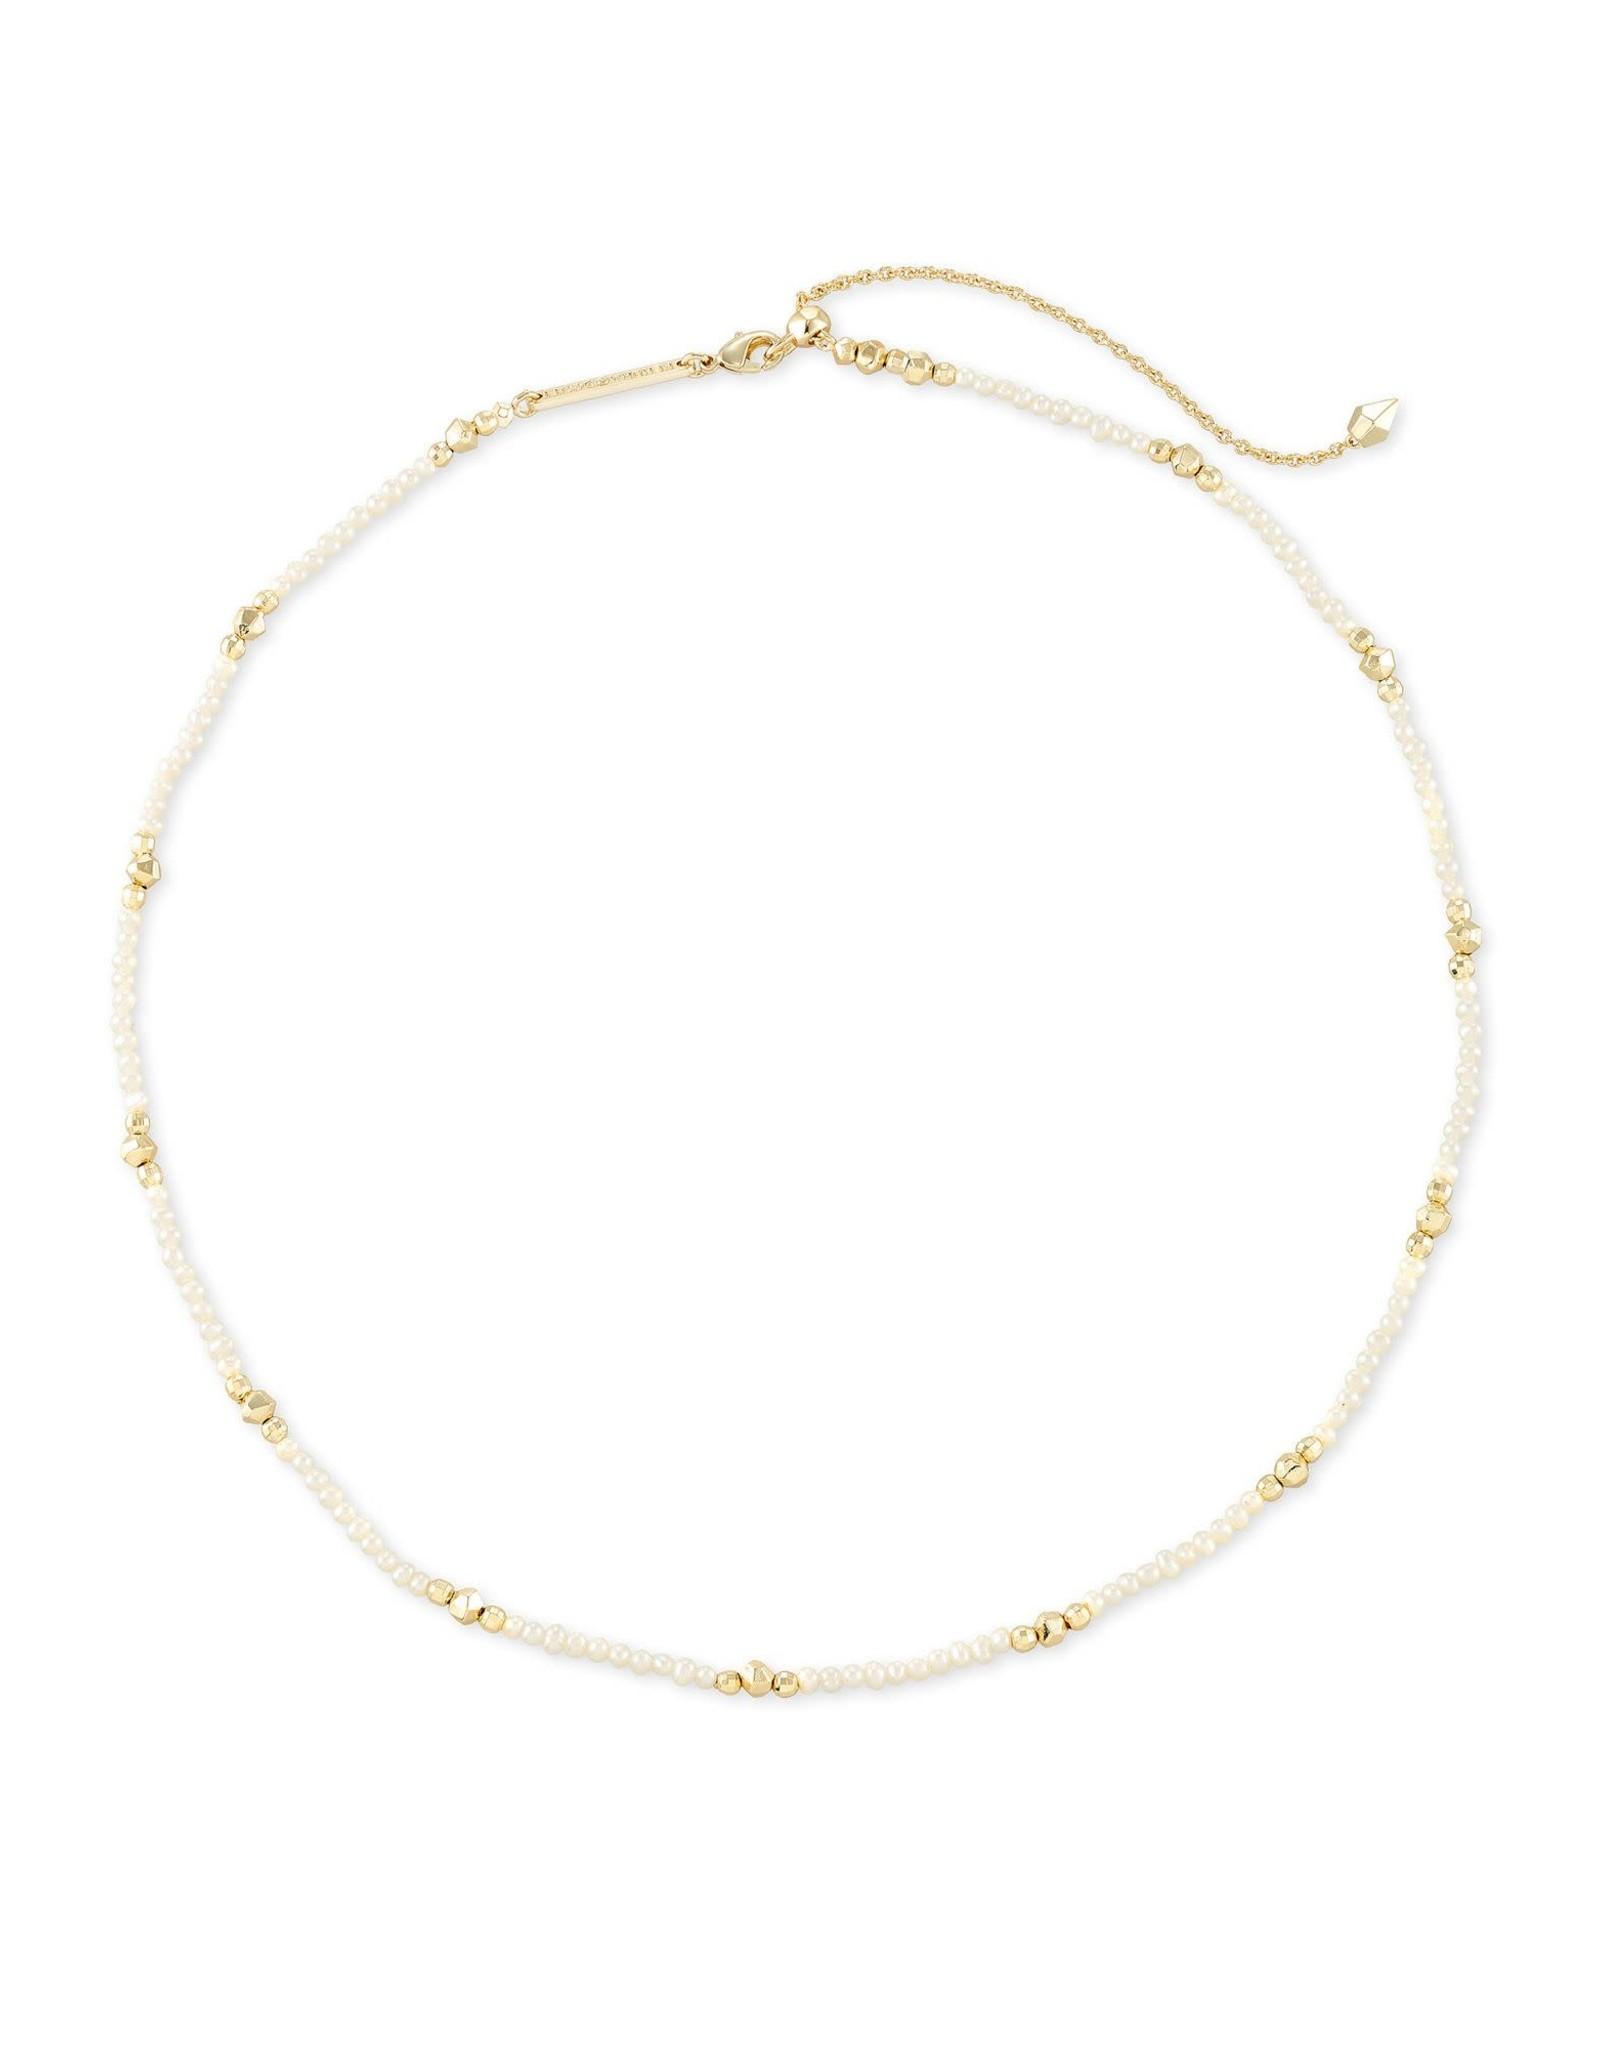 Kendra Scott Scarlet Choker Necklace - White Pearl/Gold